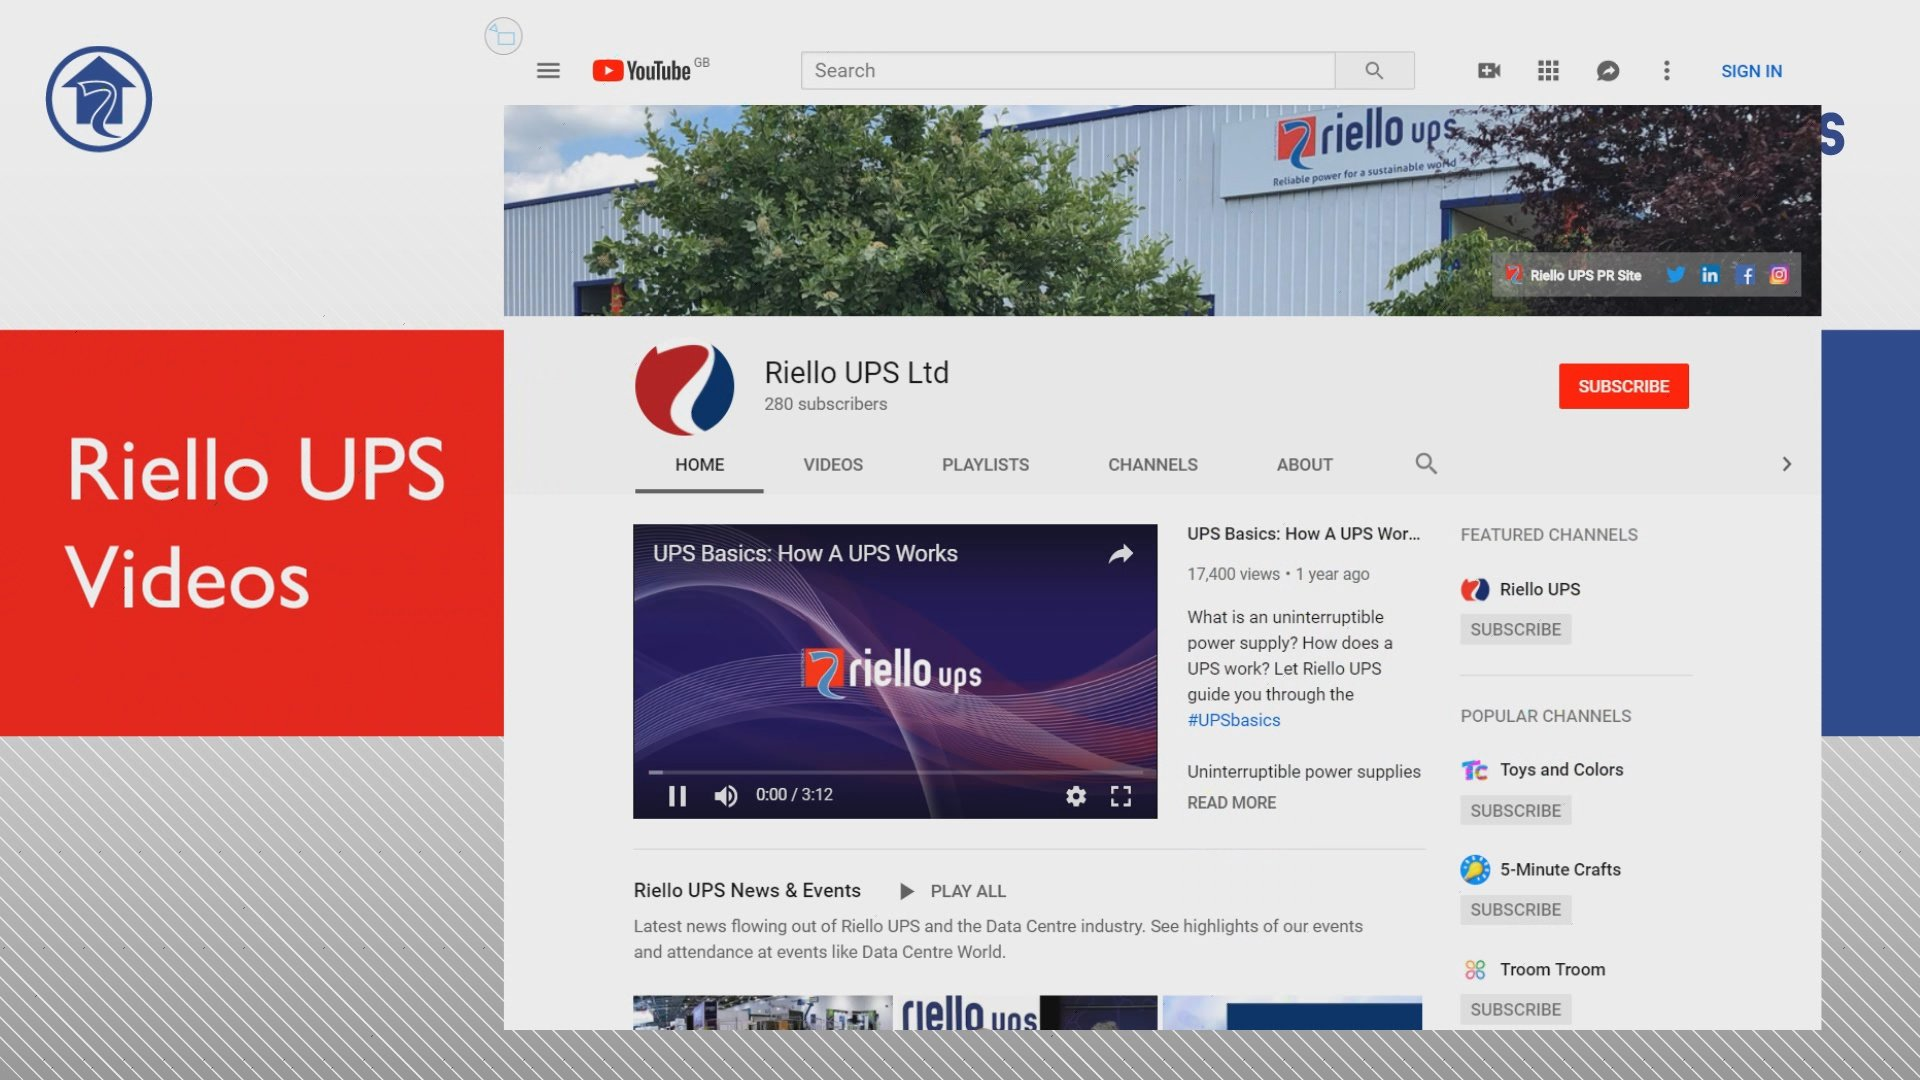 Riello UPS Interactive Experience